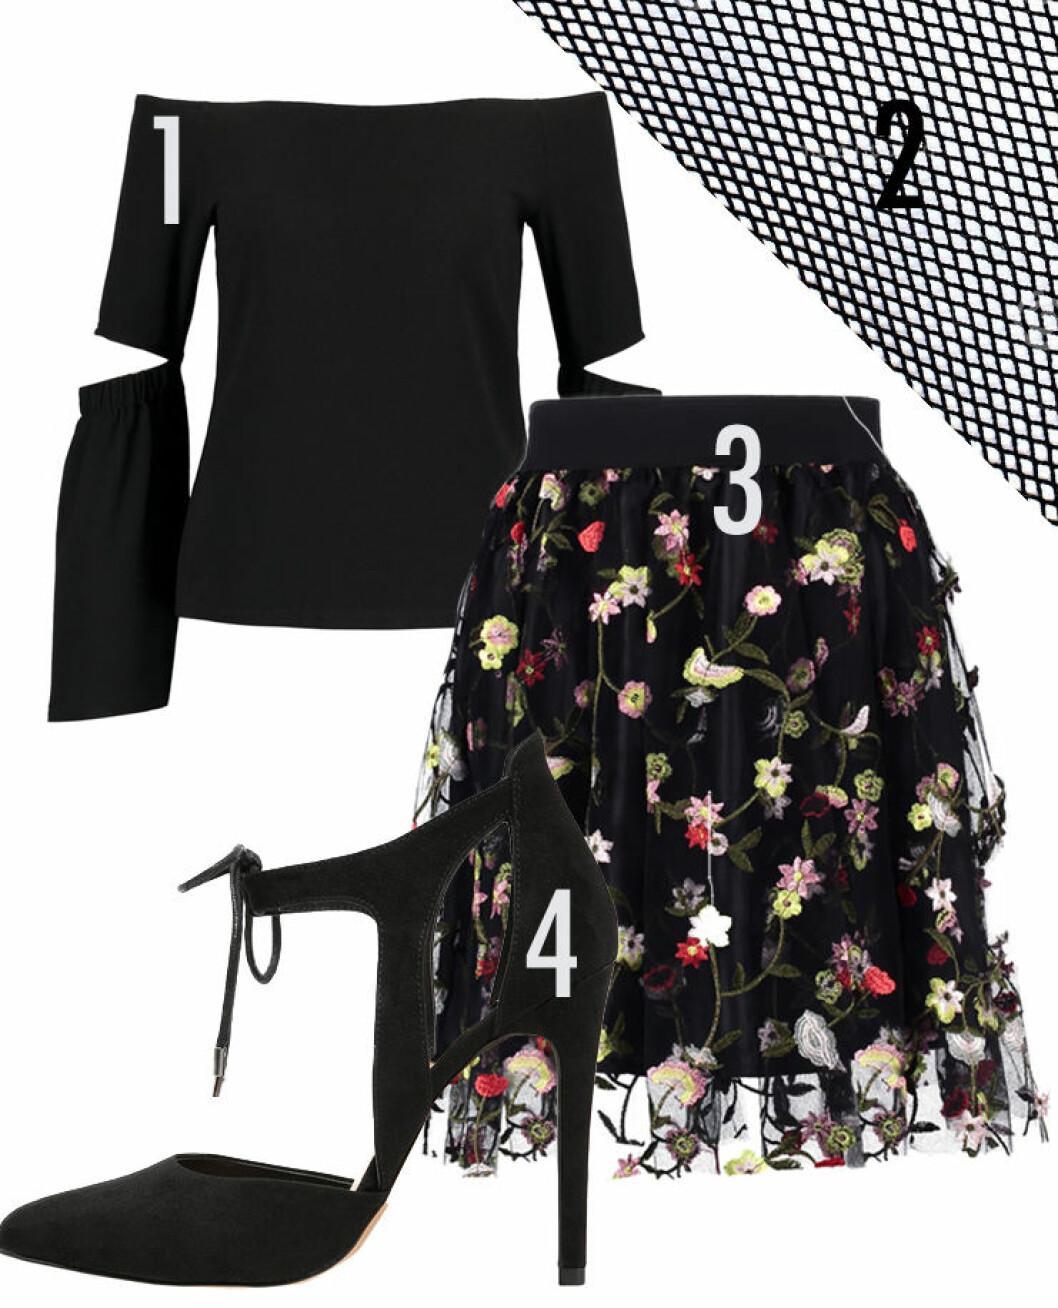 fest outfit budget våren 2017